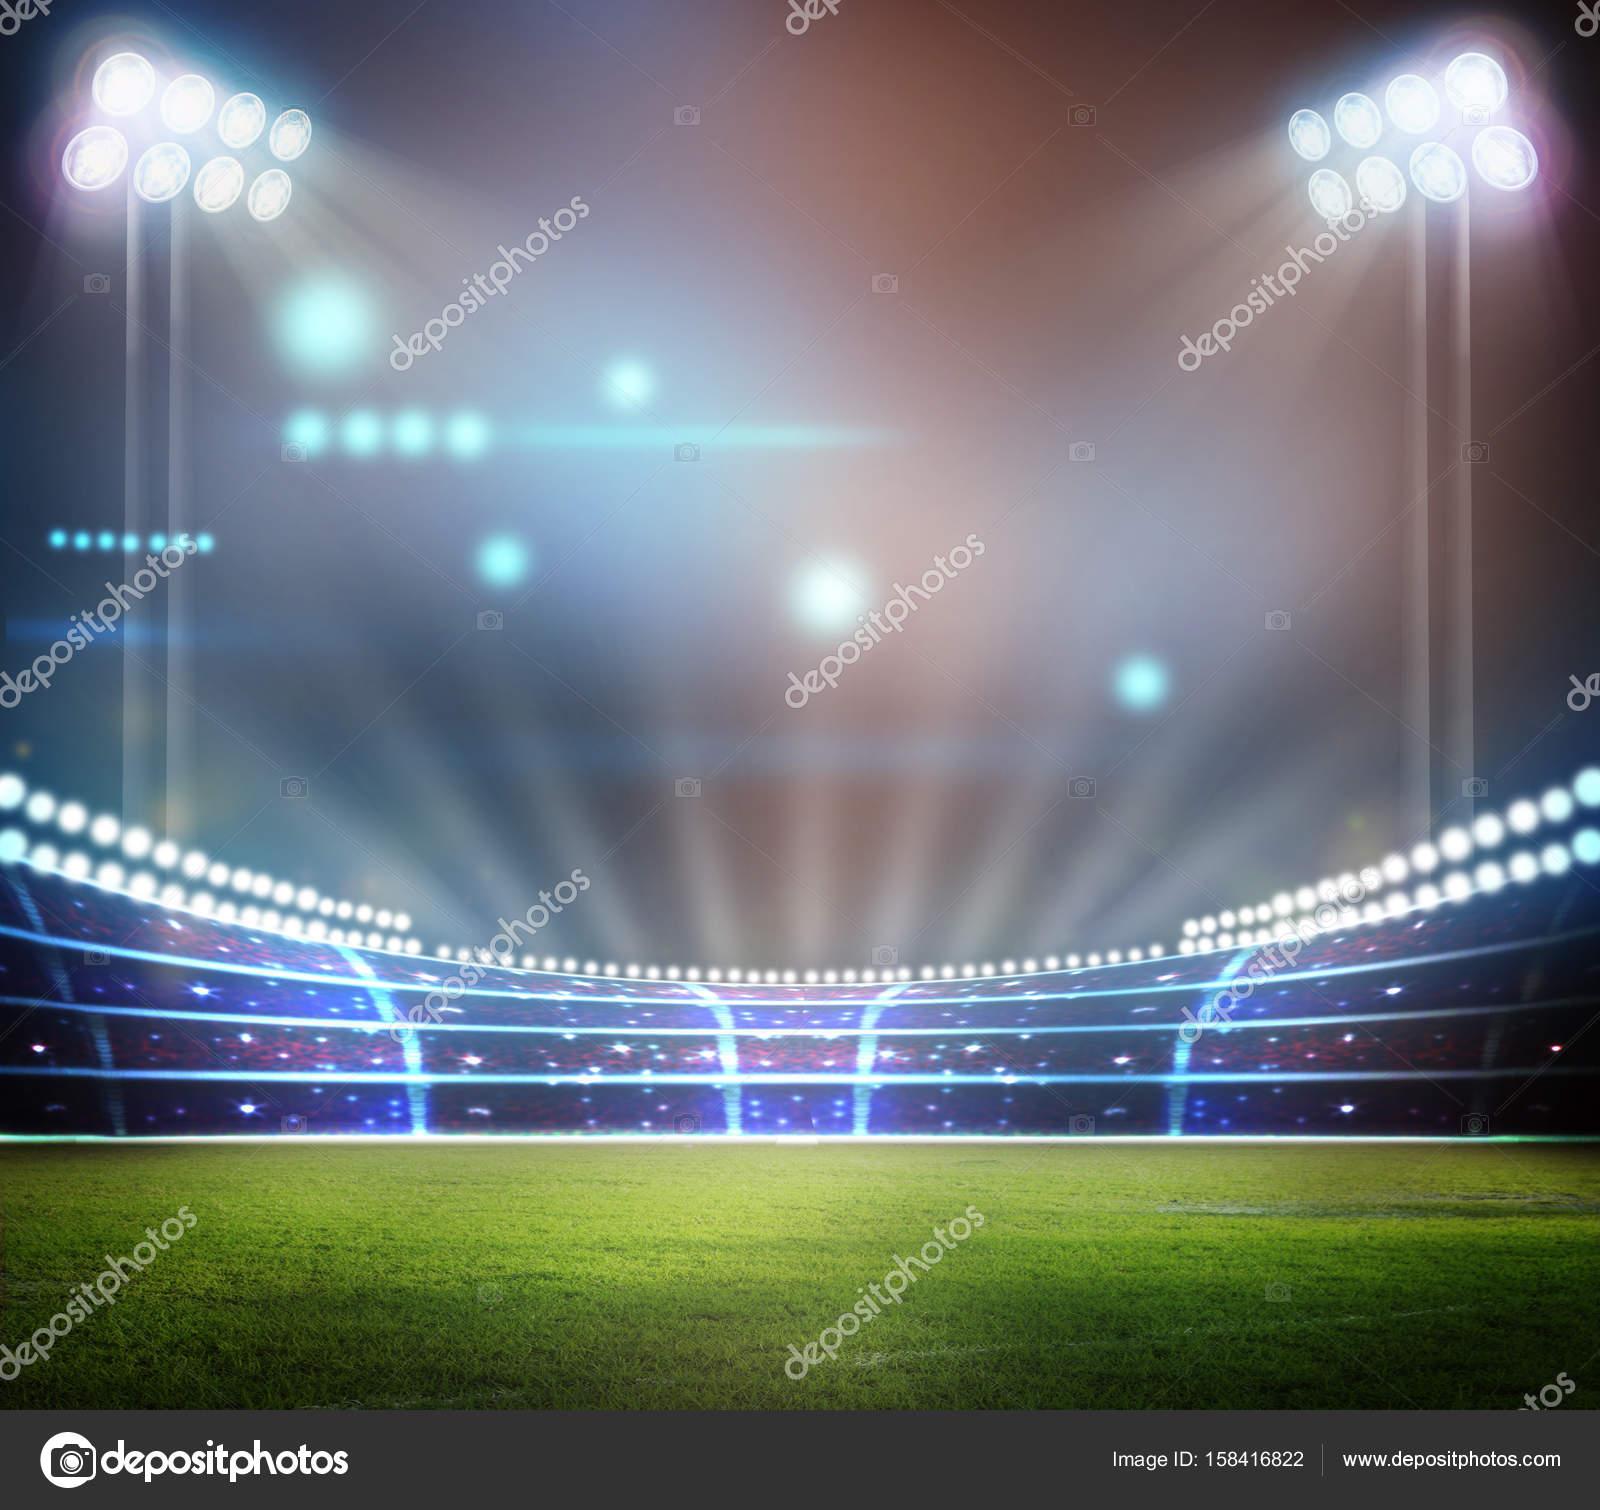 Stadium In Lights And Flashes: Foto De Stock © Wingenesis